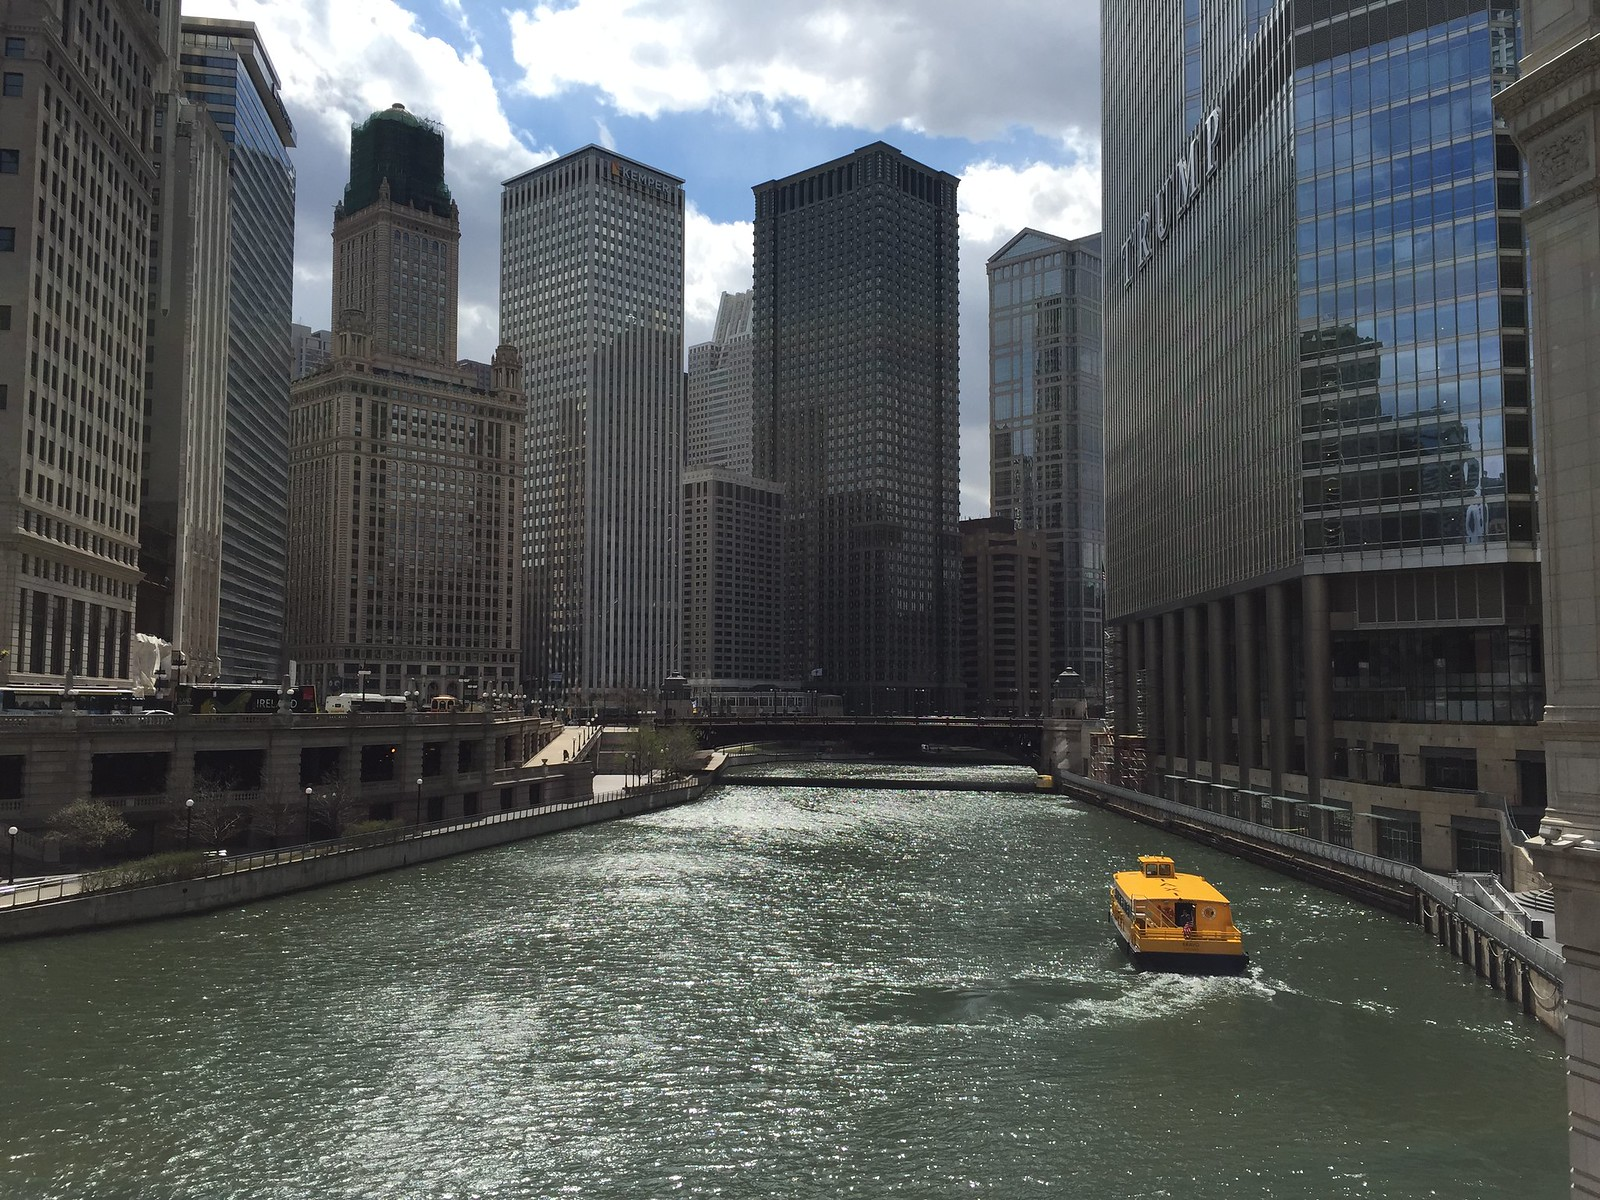 Chicago 21-04-2015 14-30-54